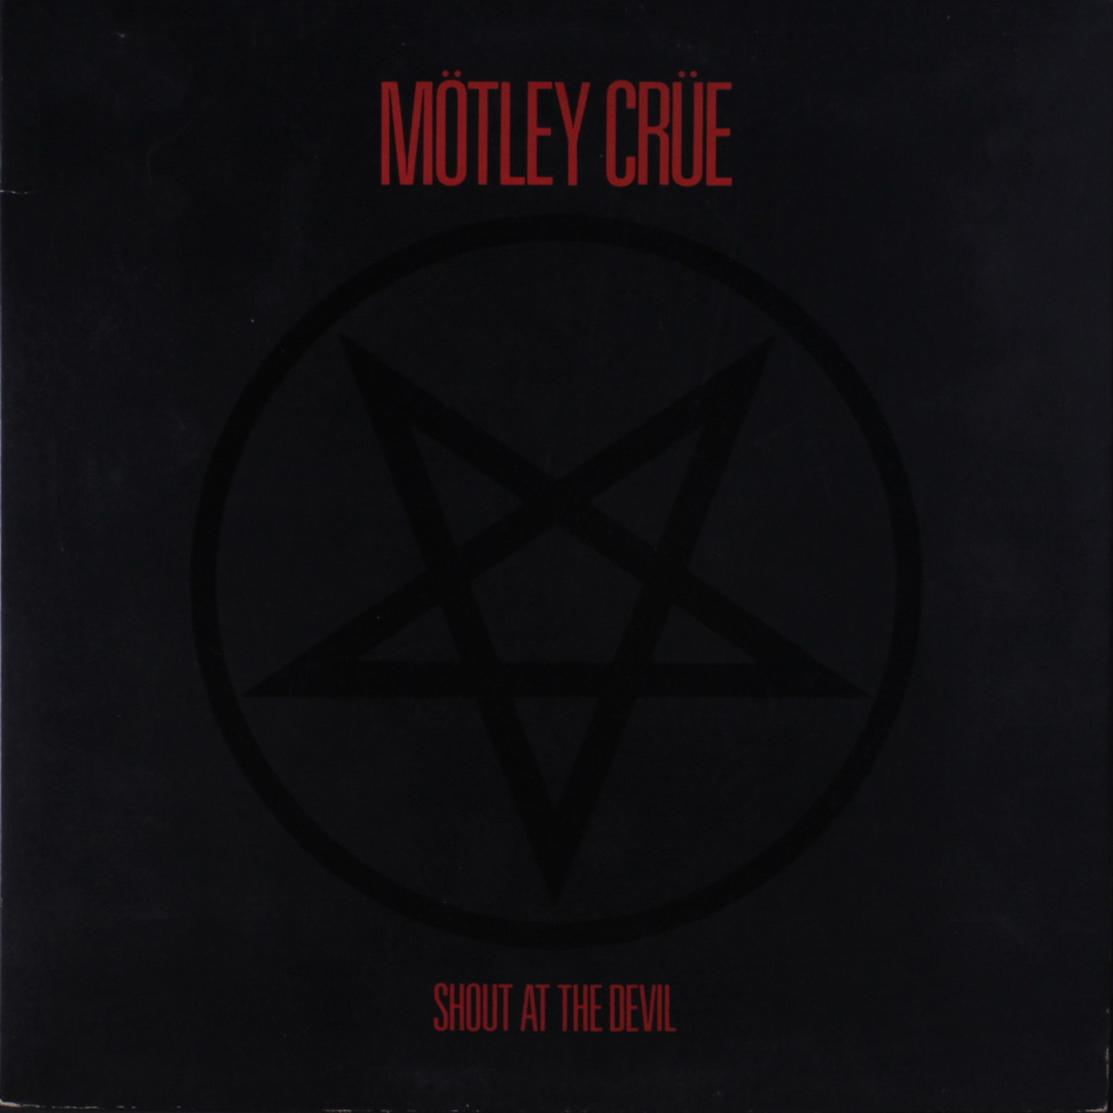 Shout at the Devil - Release Date: September 26, 1983